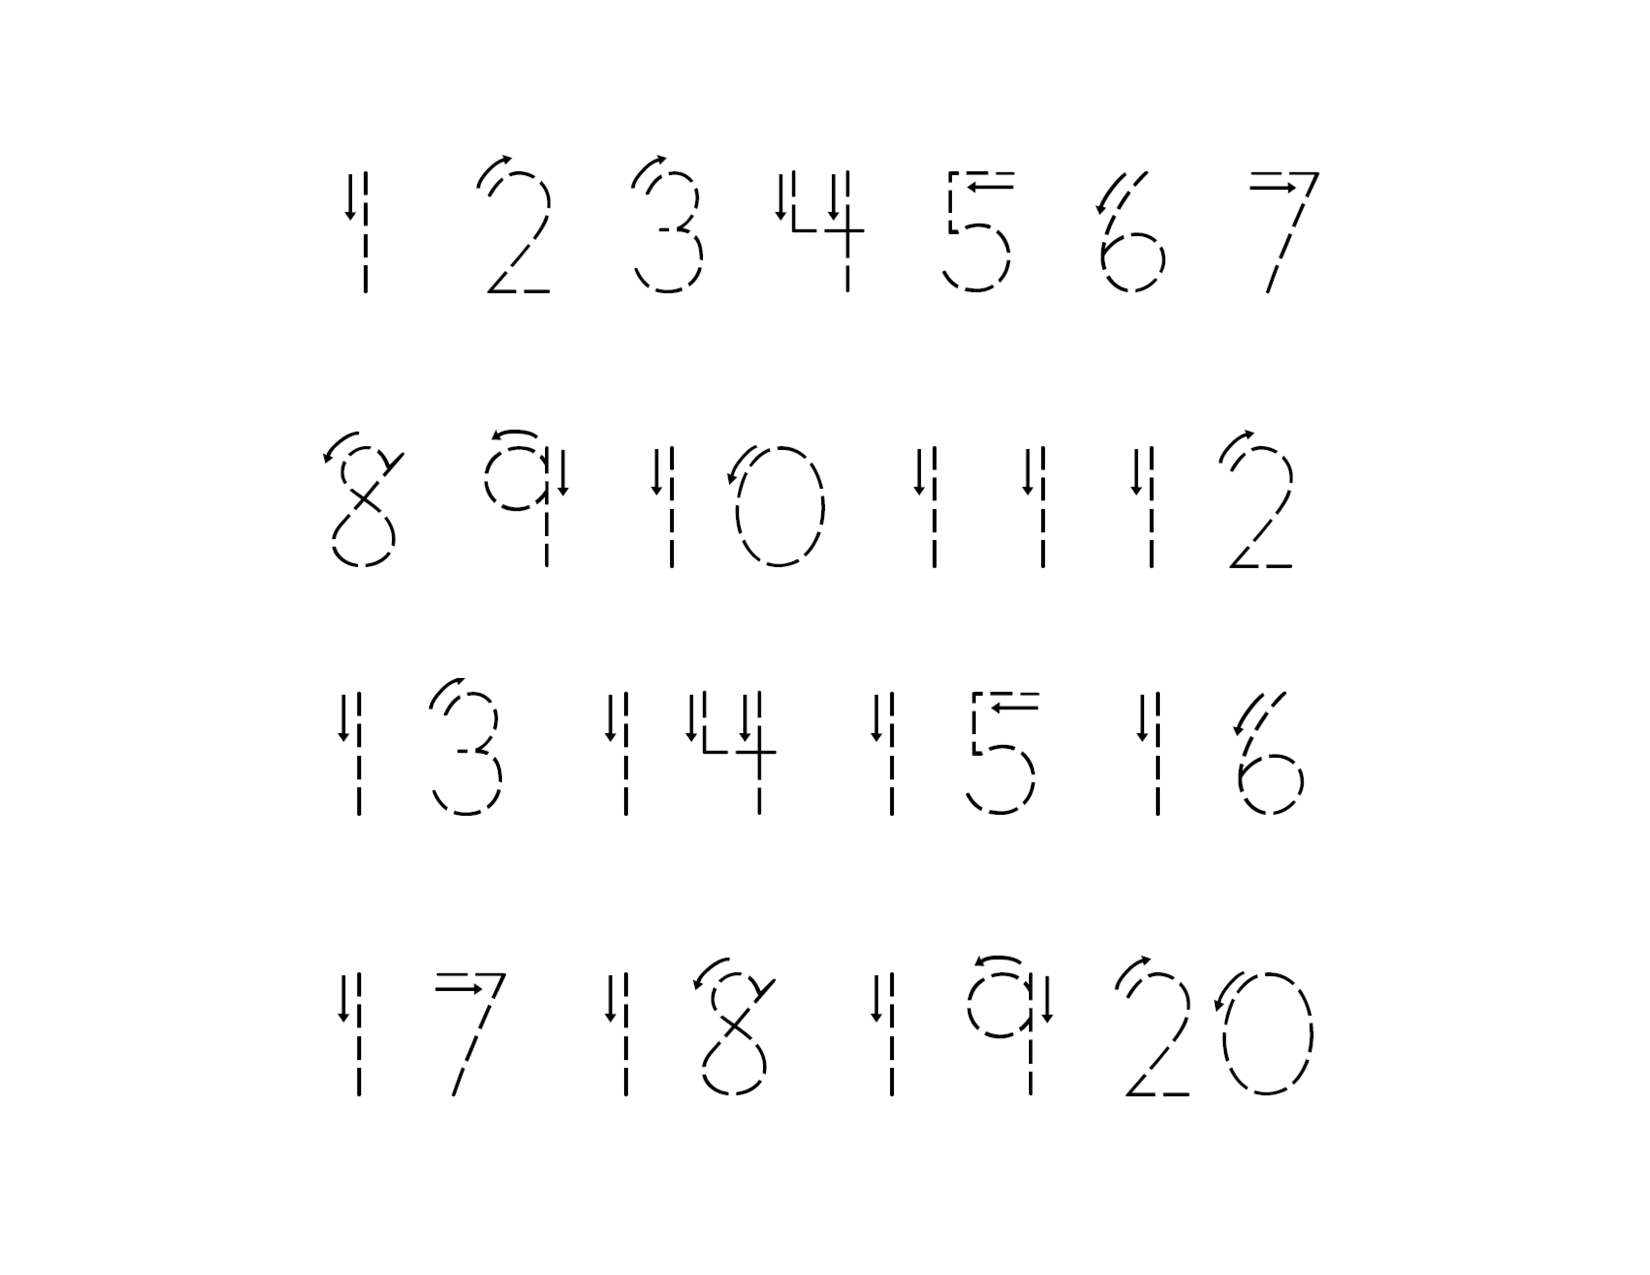 6 Images of 1 20 Worksheets Printable For Preschool